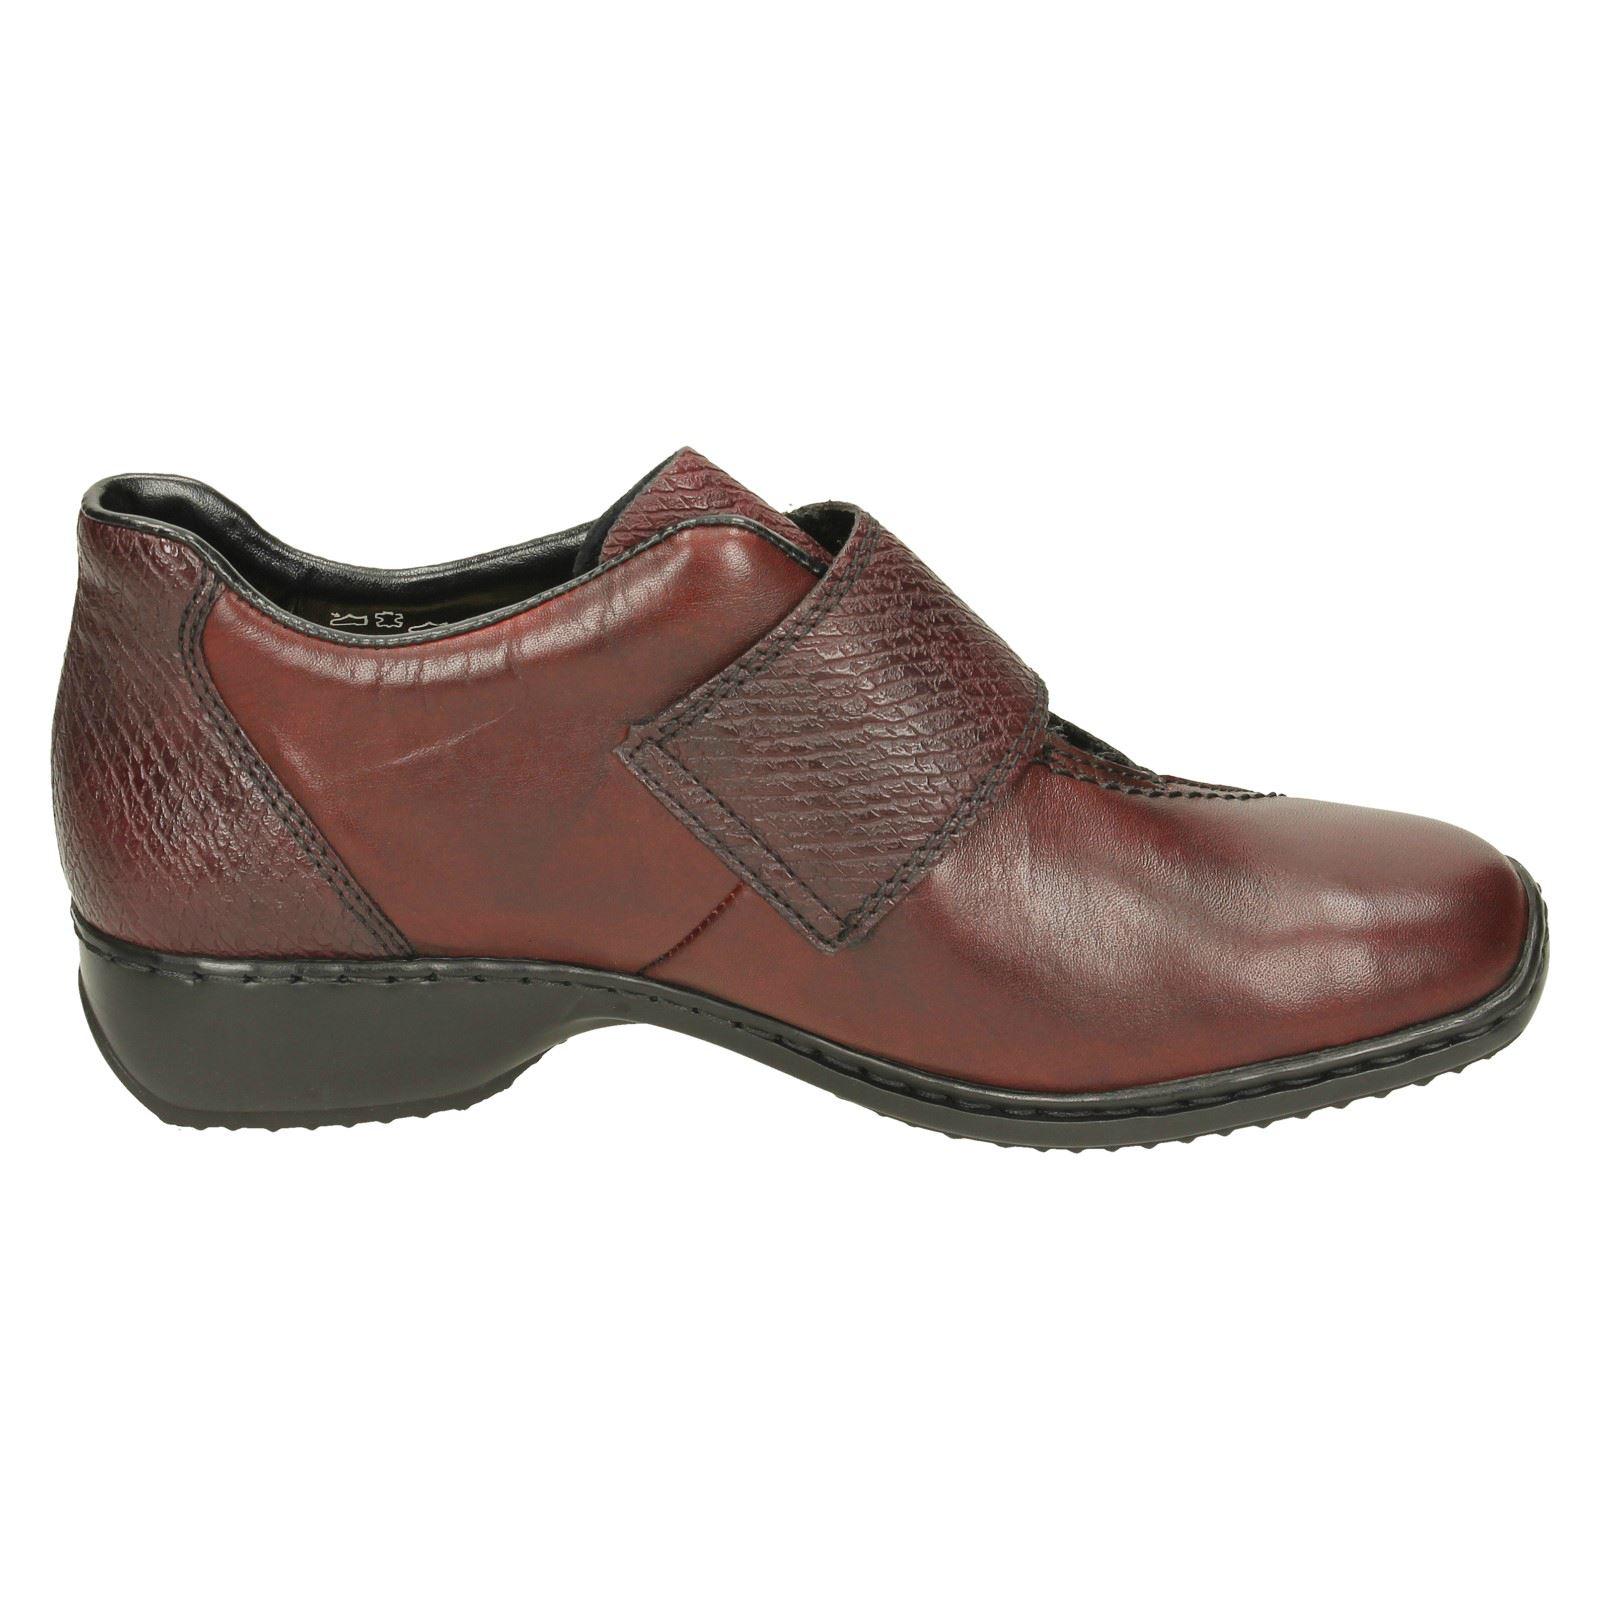 mesdames rieker occasionnel occasionnel rieker chaussure l3856 b06490